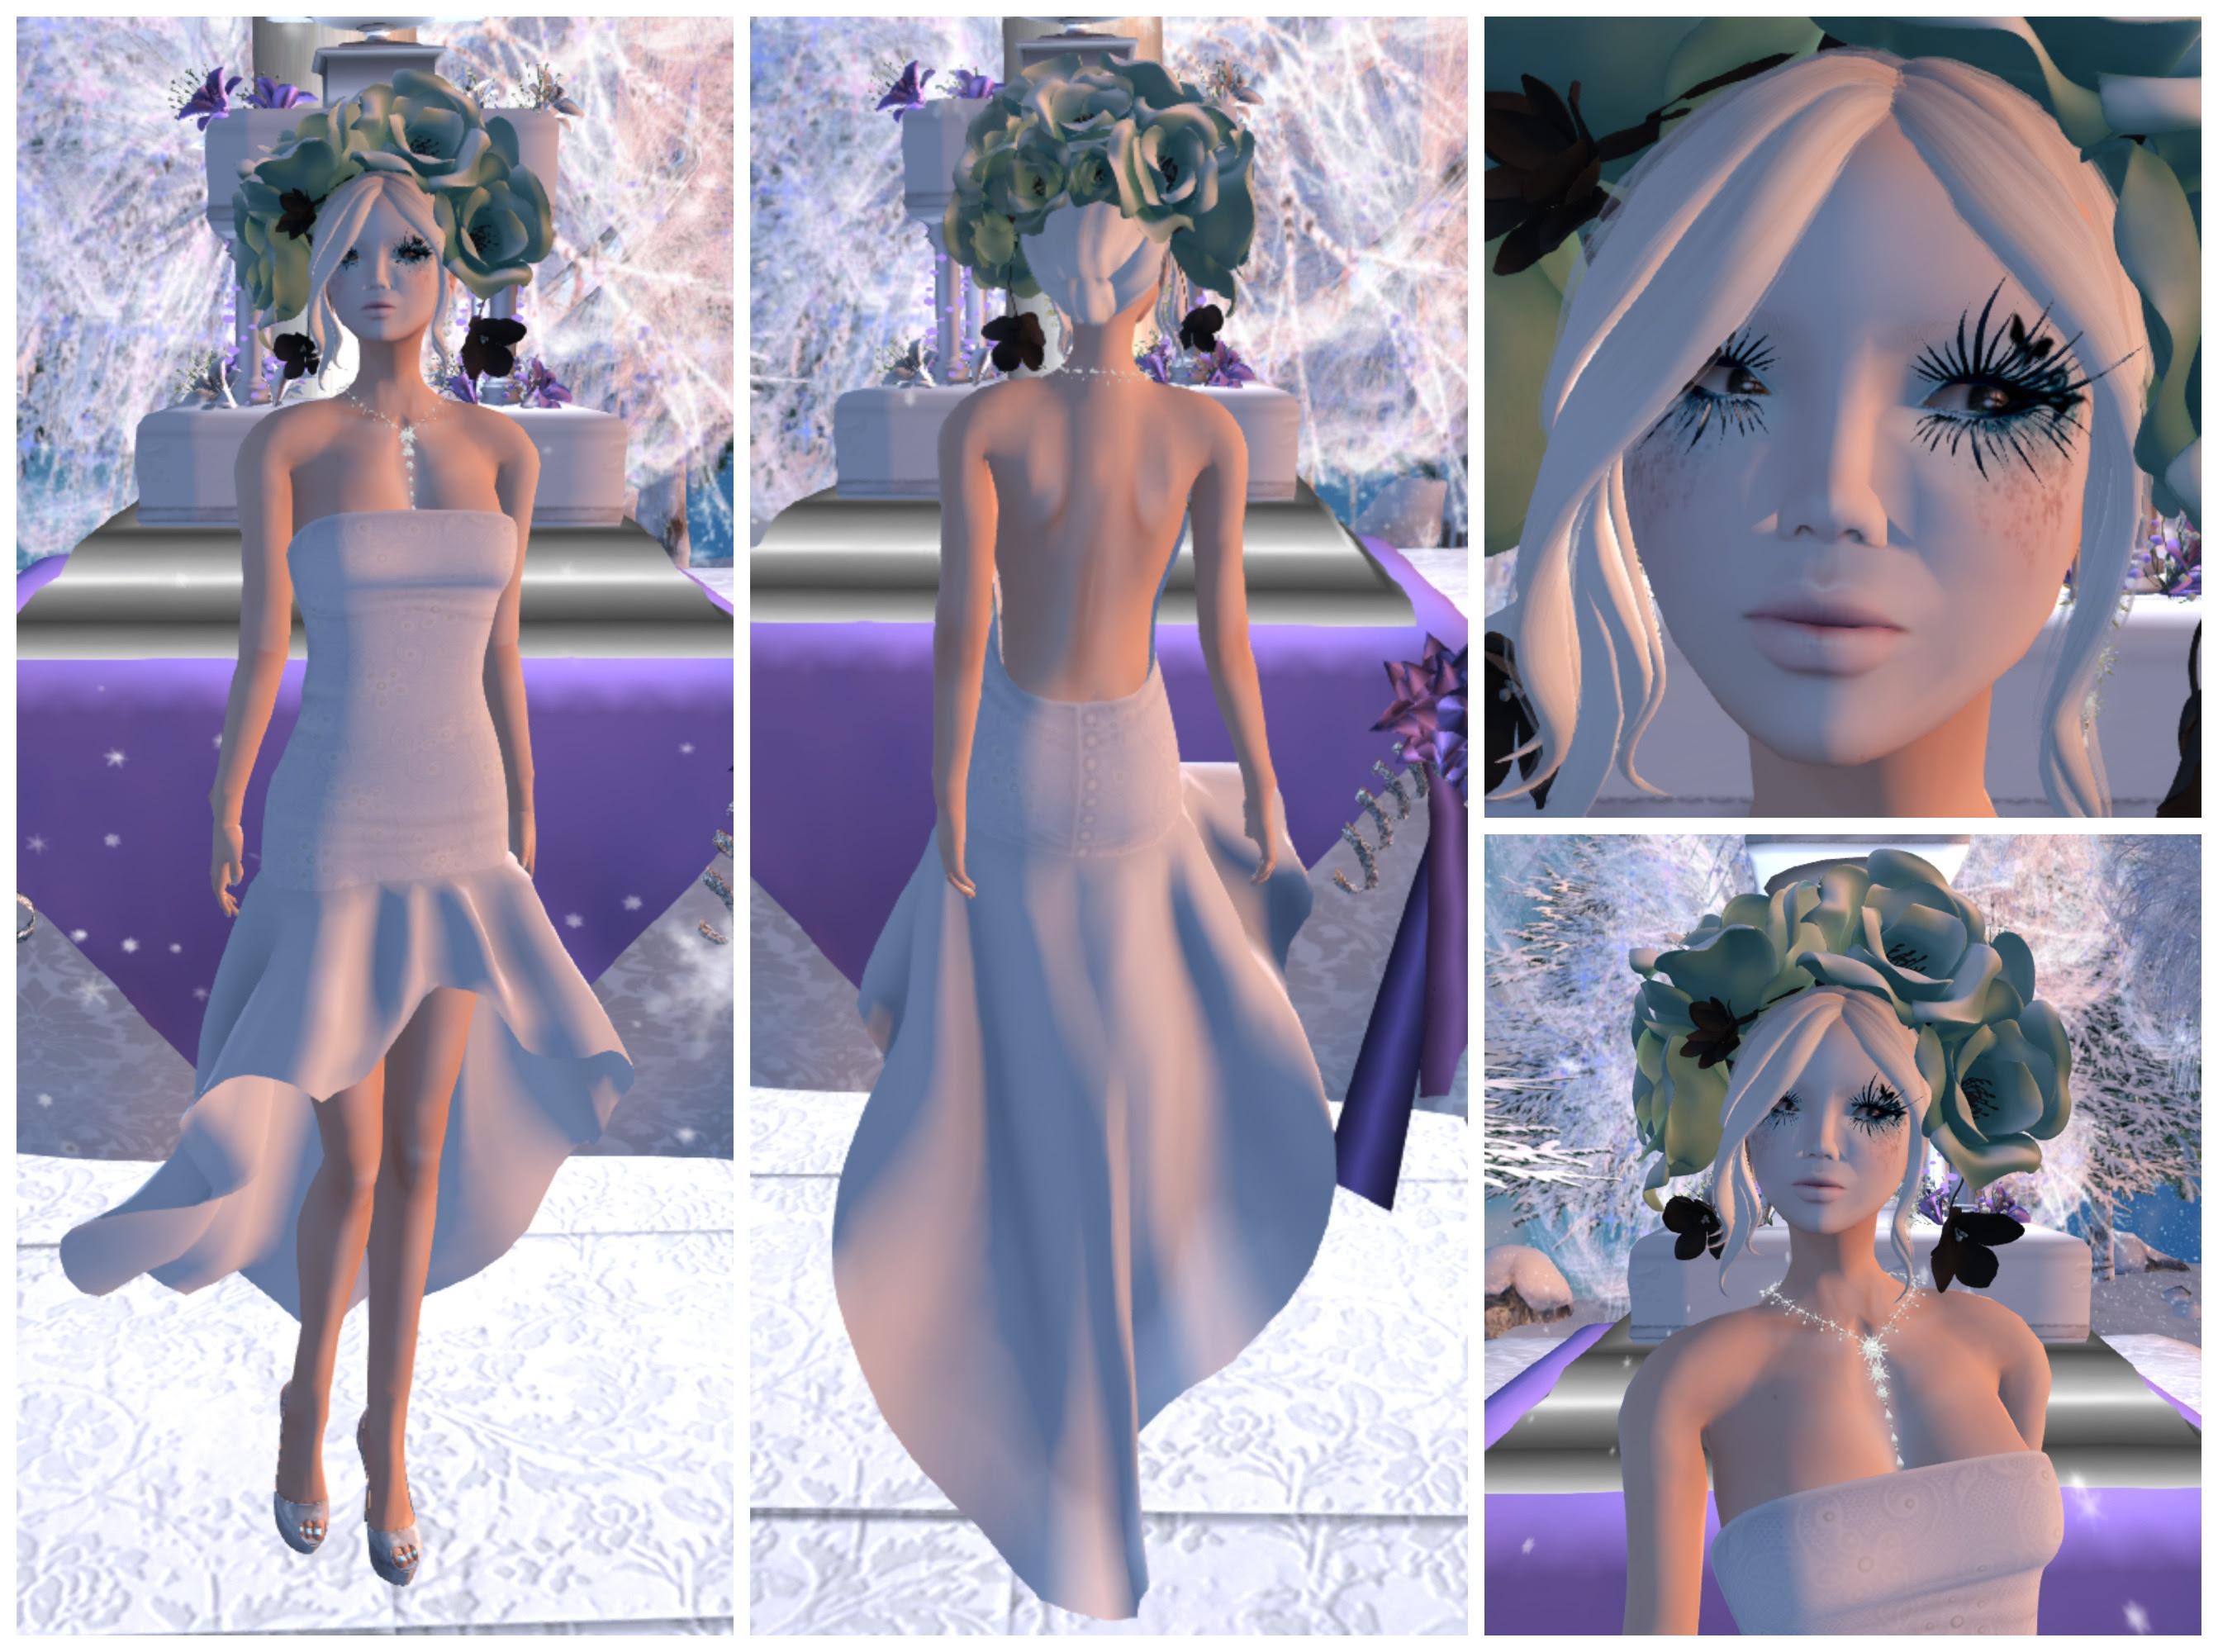 Tableau Vivant - Snow Queen  feat Coquet Shiver Formal Gown